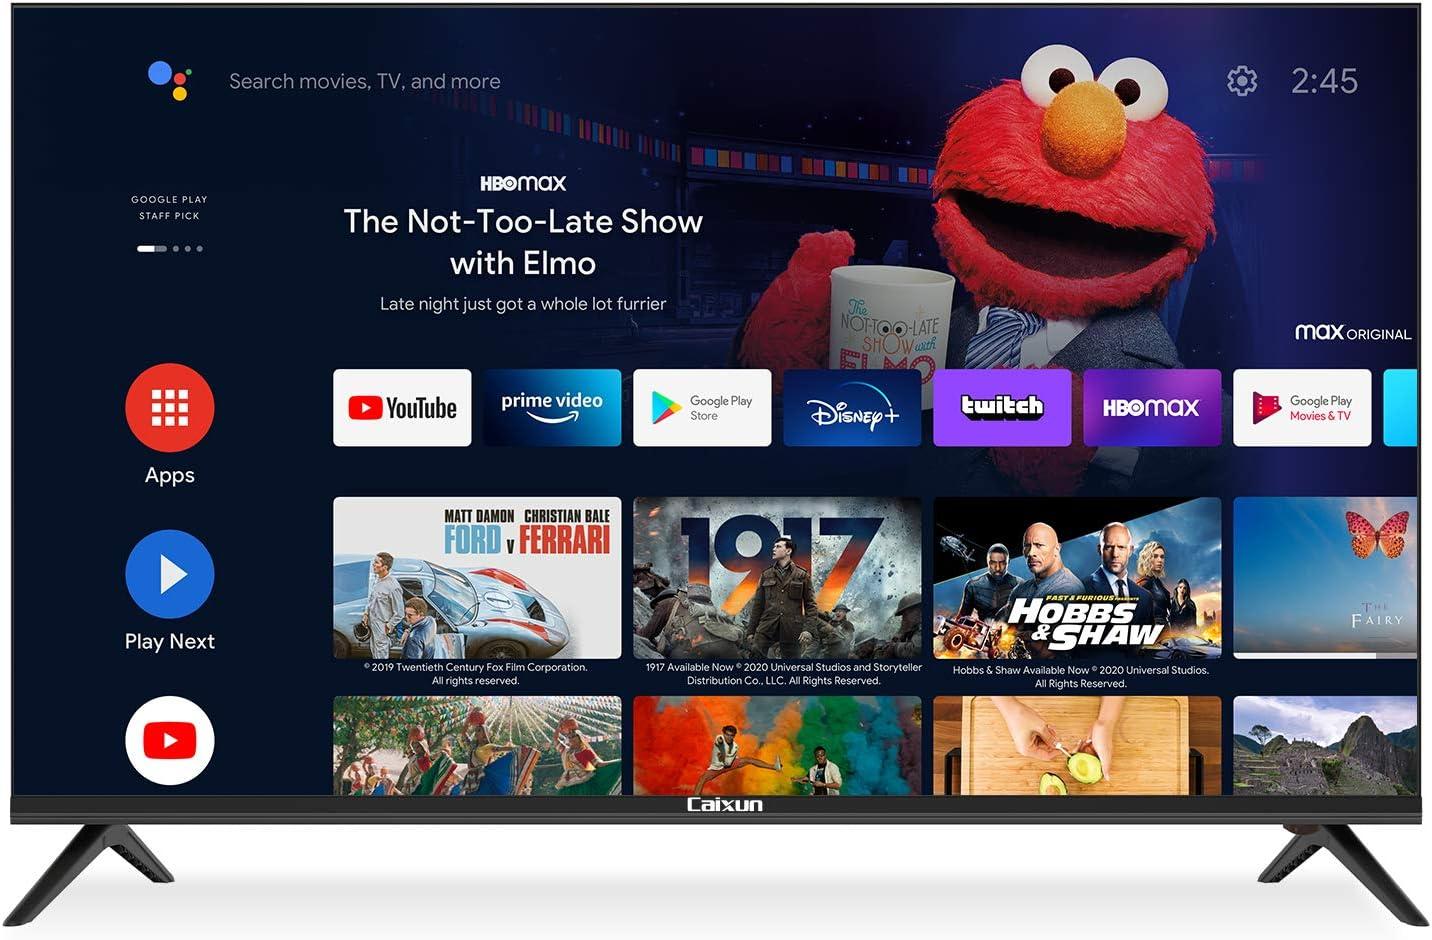 Caixun Android 9.0 TV Smart LED TV EC50S1A de 50 Pulgadas,4K Television,HDR10,Bluetooth,Youtube,Netflix,Prime Video,Sintonizador Triple,Procesador ...